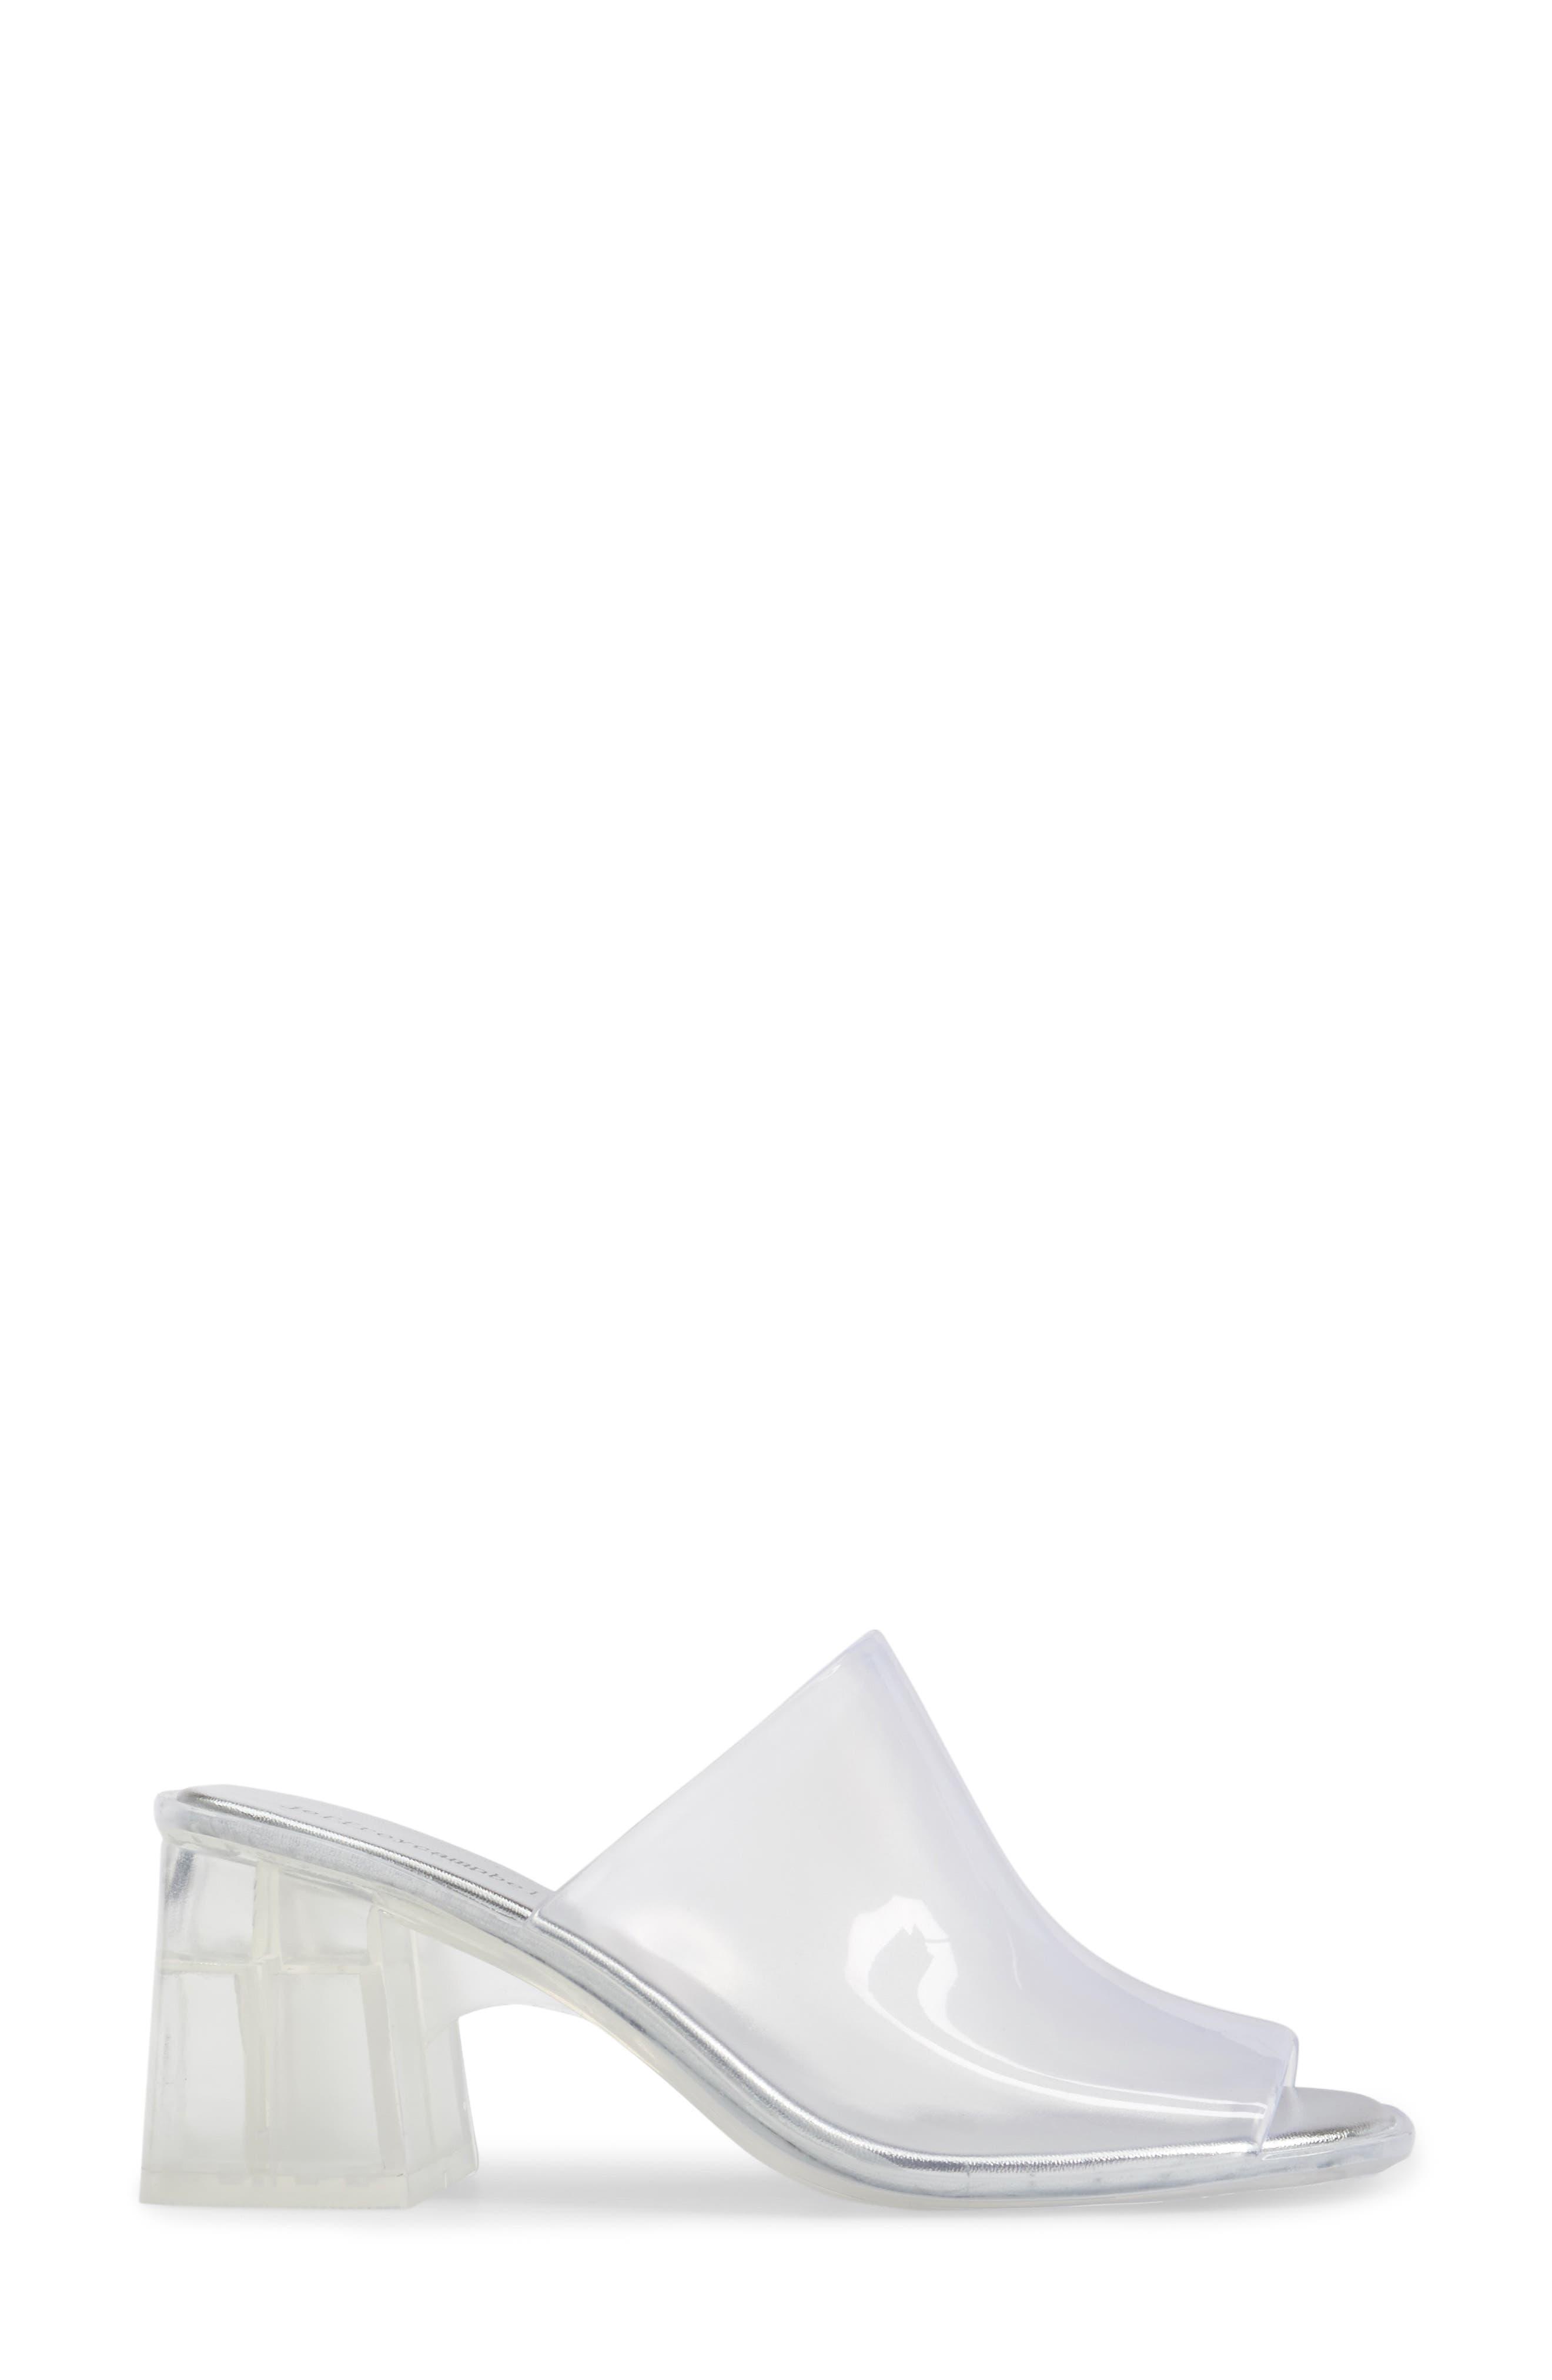 Alternate Image 3  - Jeffrey Campbell Jelly Slide Sandal (Women)